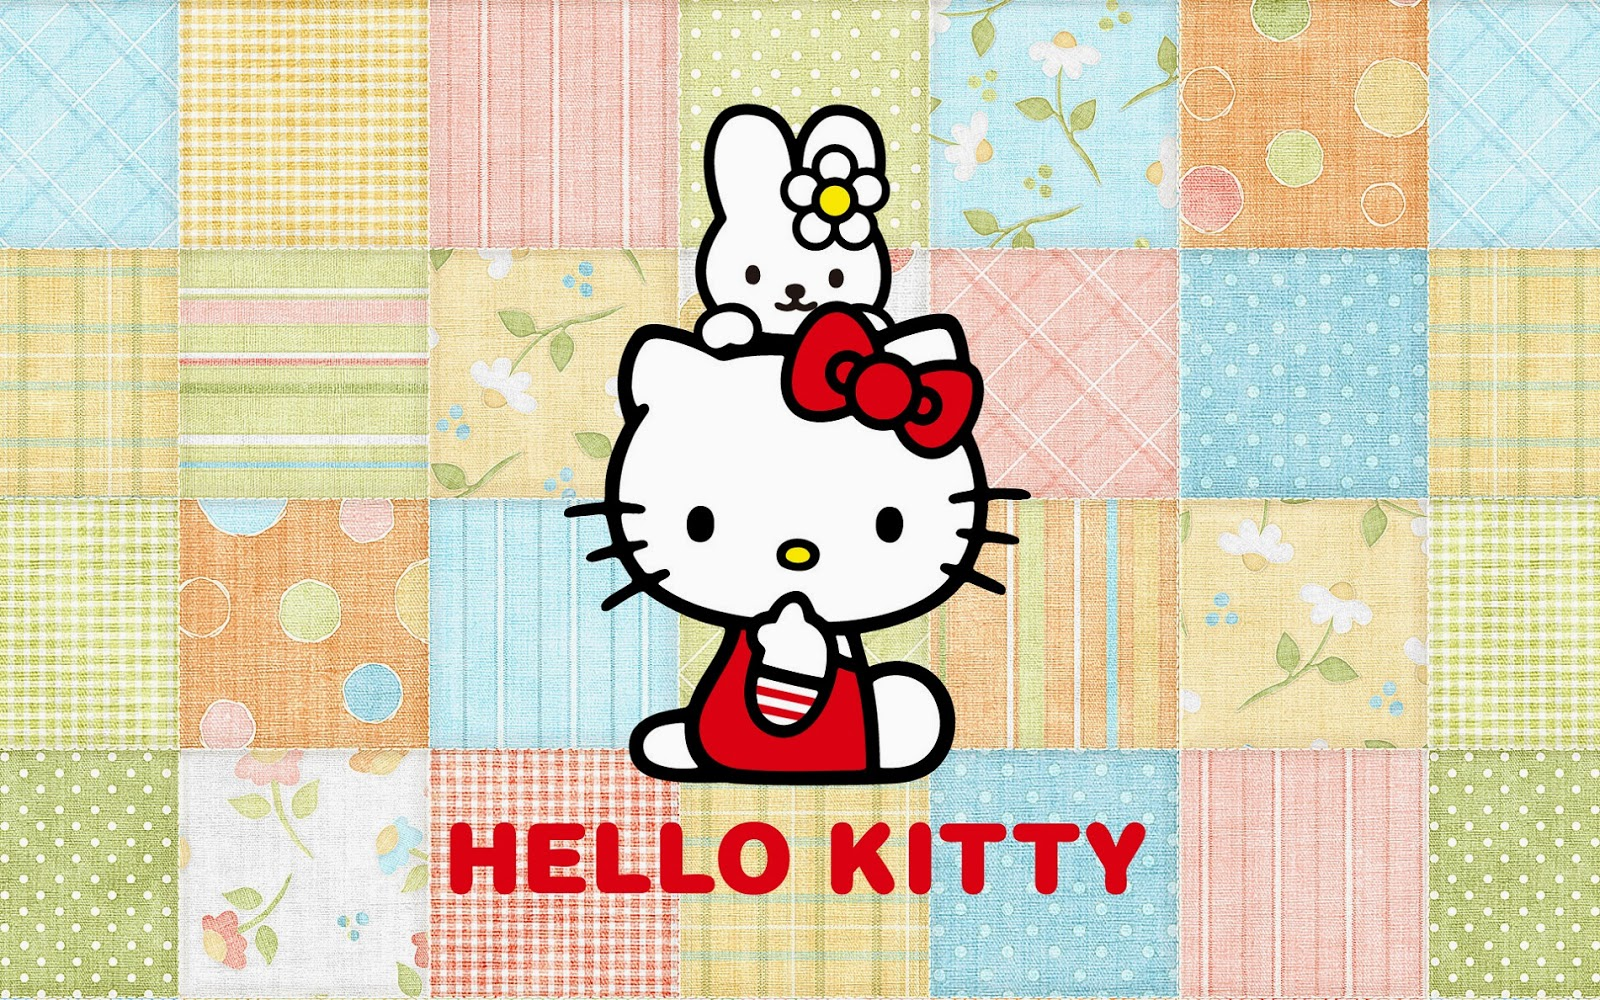 109090 O Kitty Hd Desktop Wallpaperz